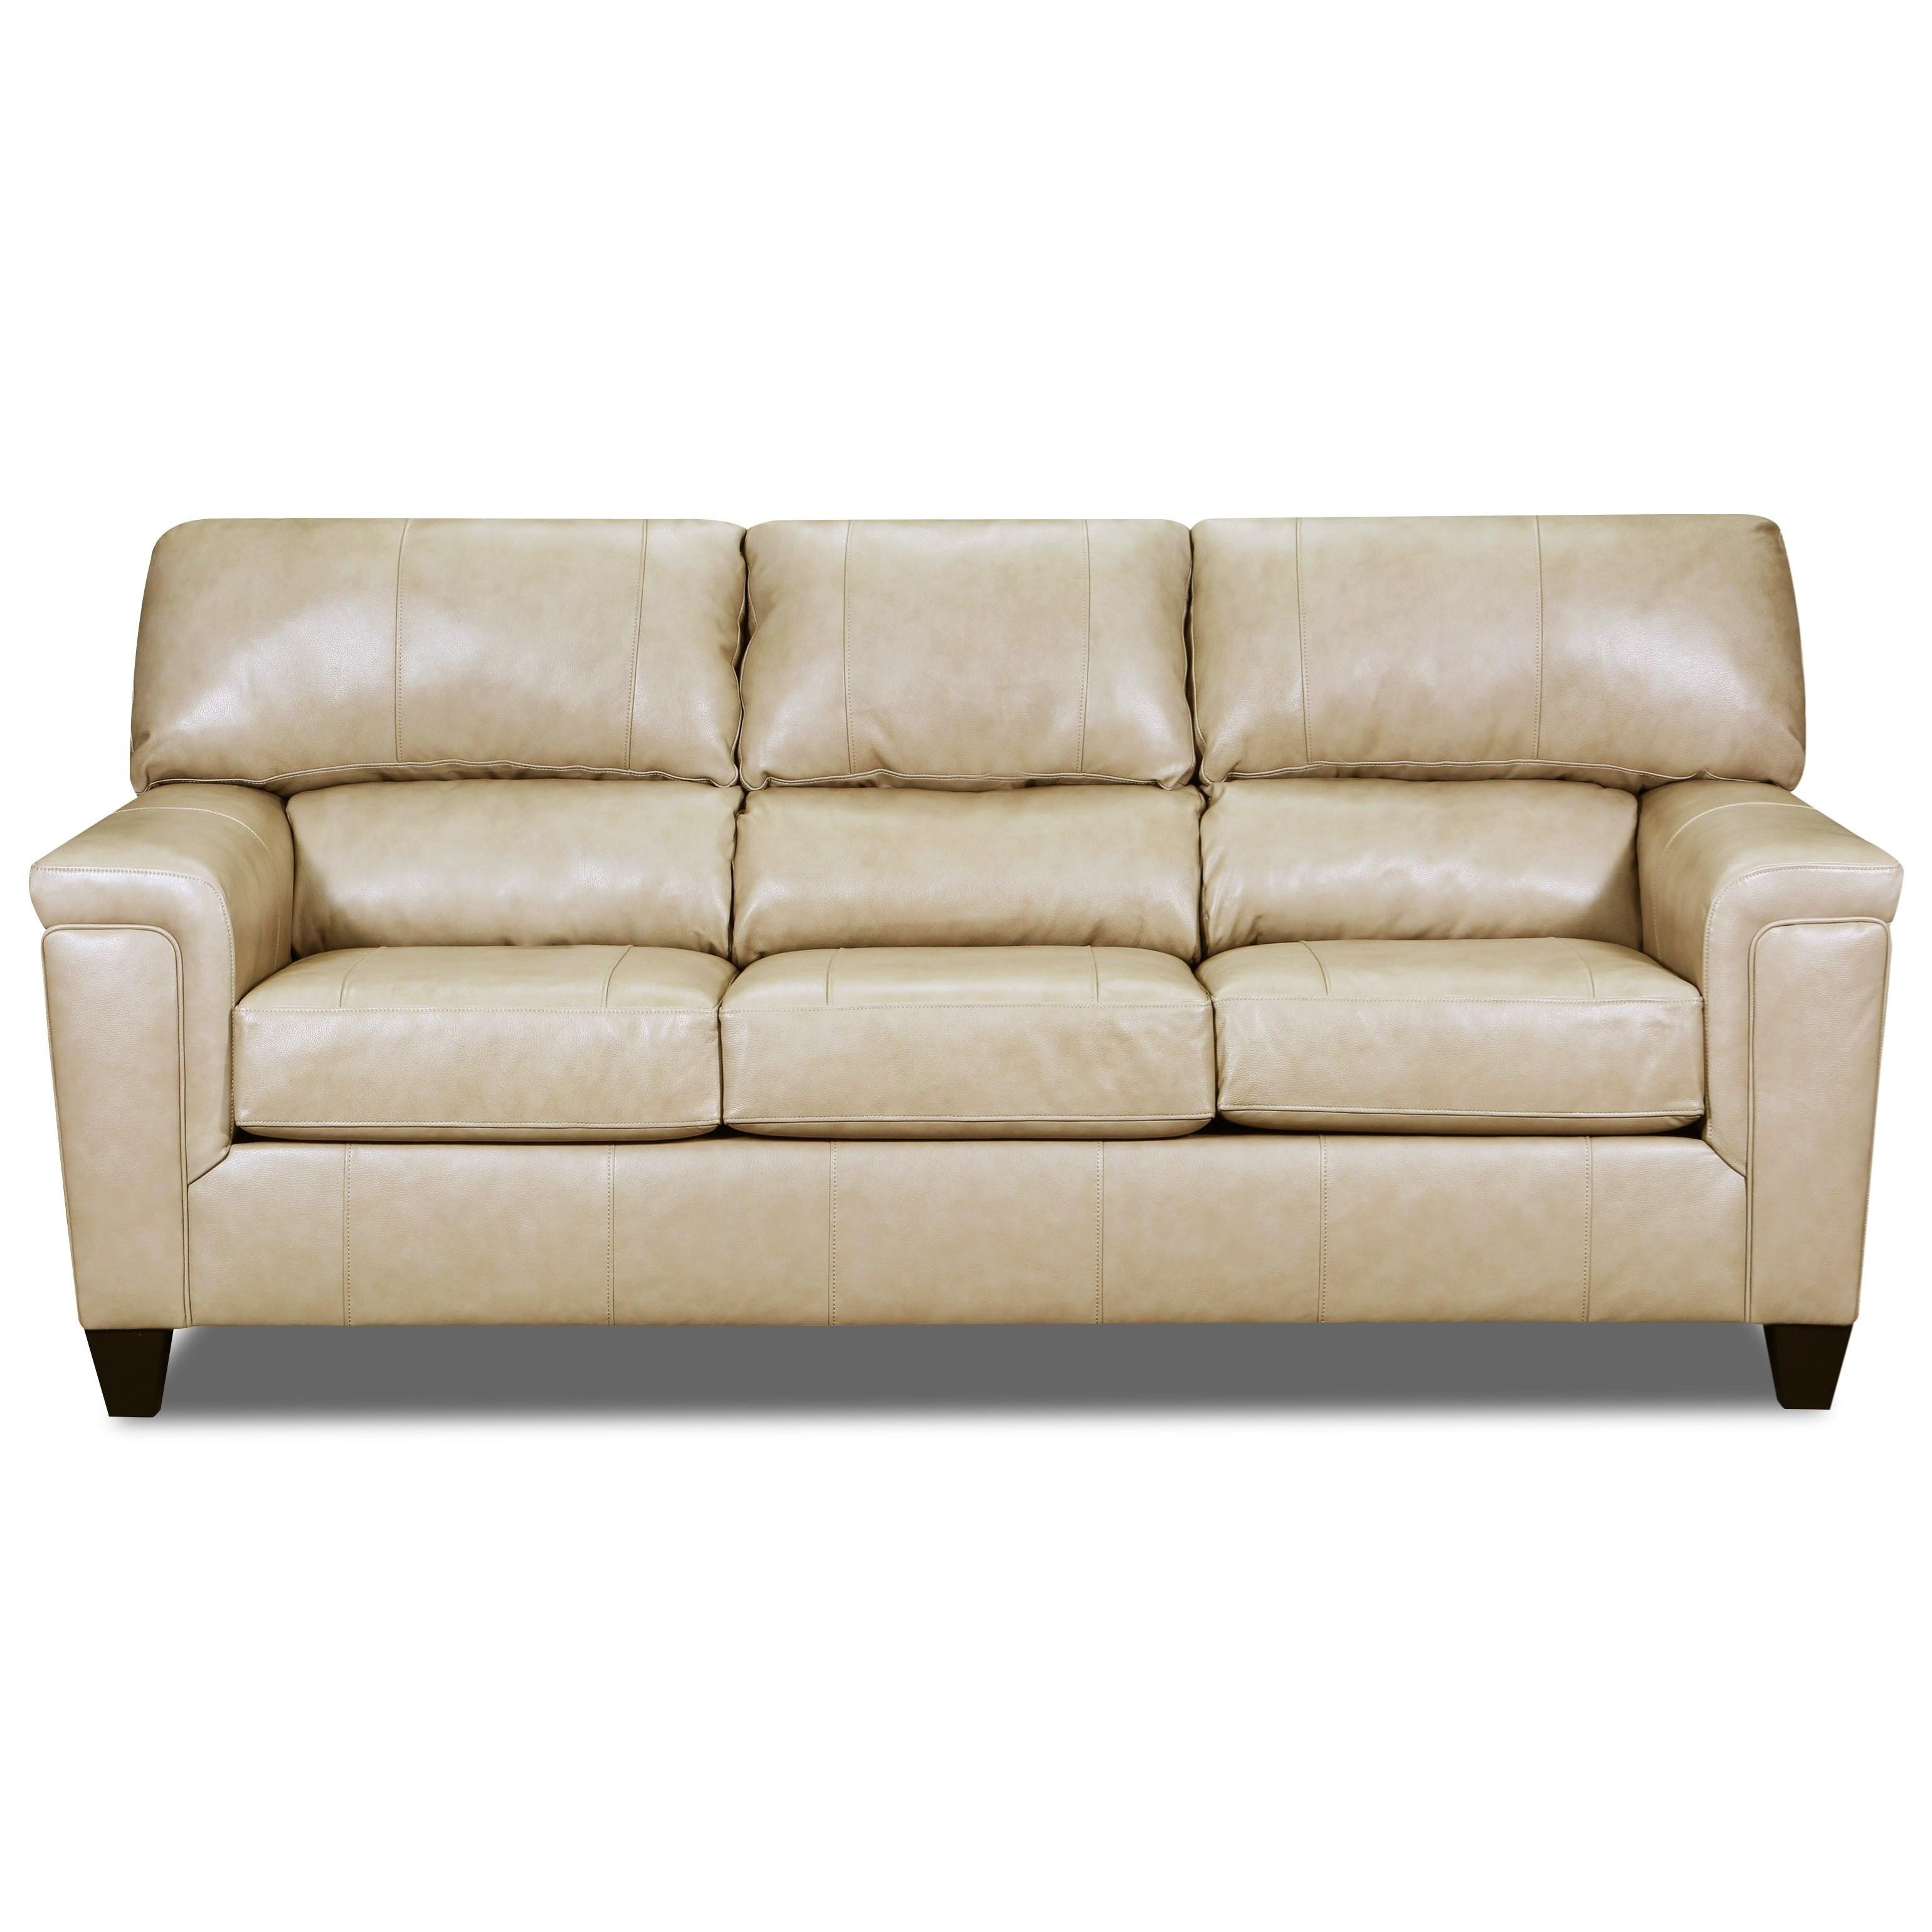 2038 Sofa by Lane at Story & Lee Furniture